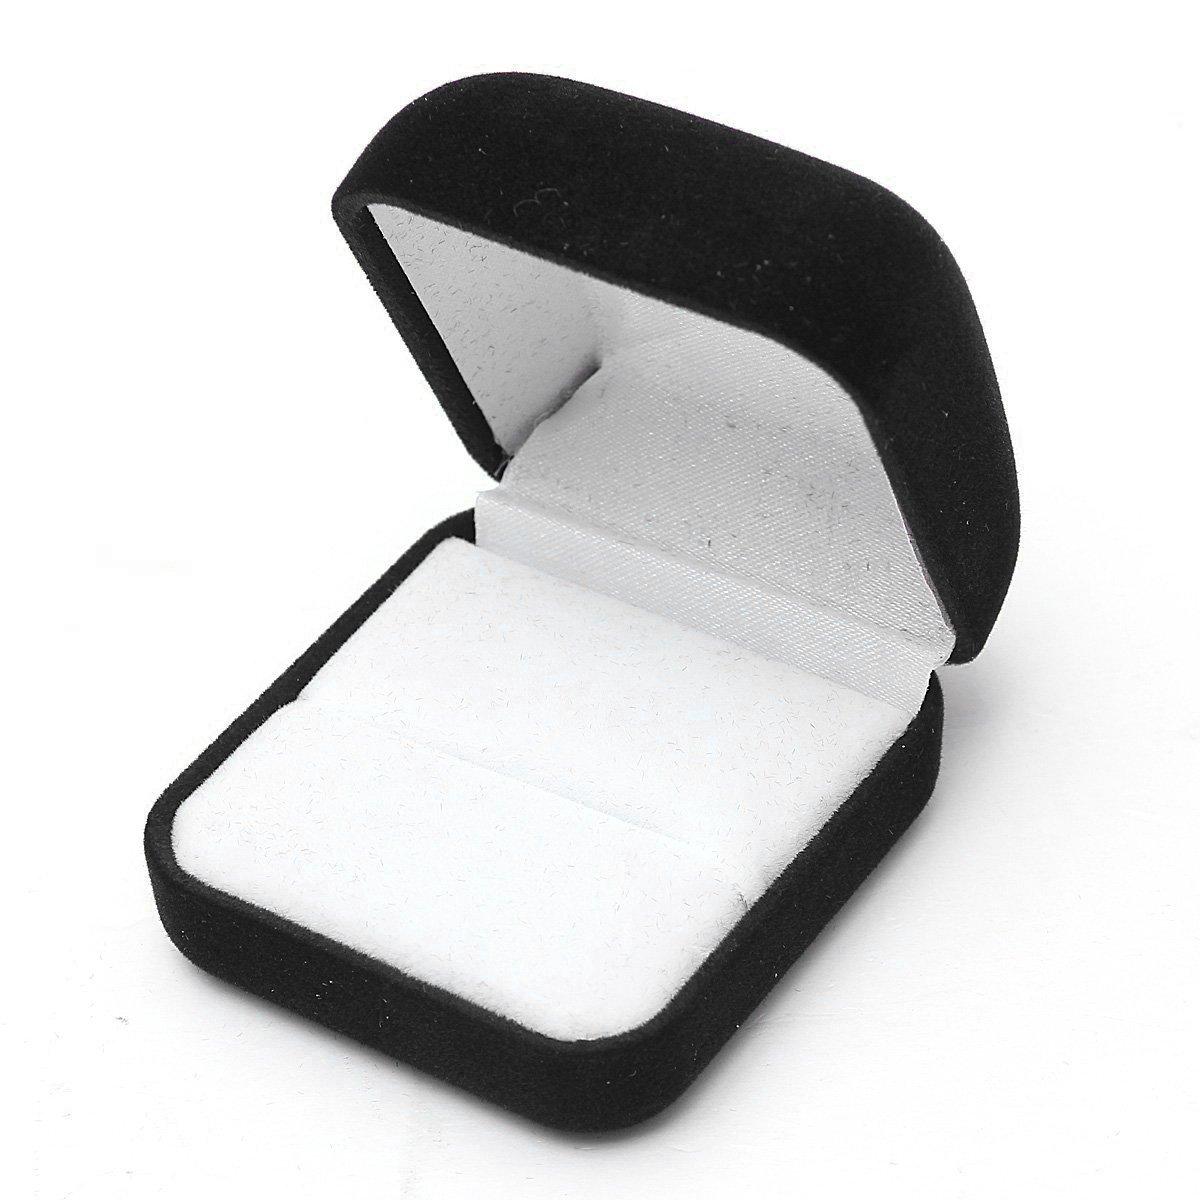 Cikuso 1 pz Estuche Caja de Joya Negro Regalo Anillos aretes exposicion de Terciopelo de Joya: Amazon.es: Hogar